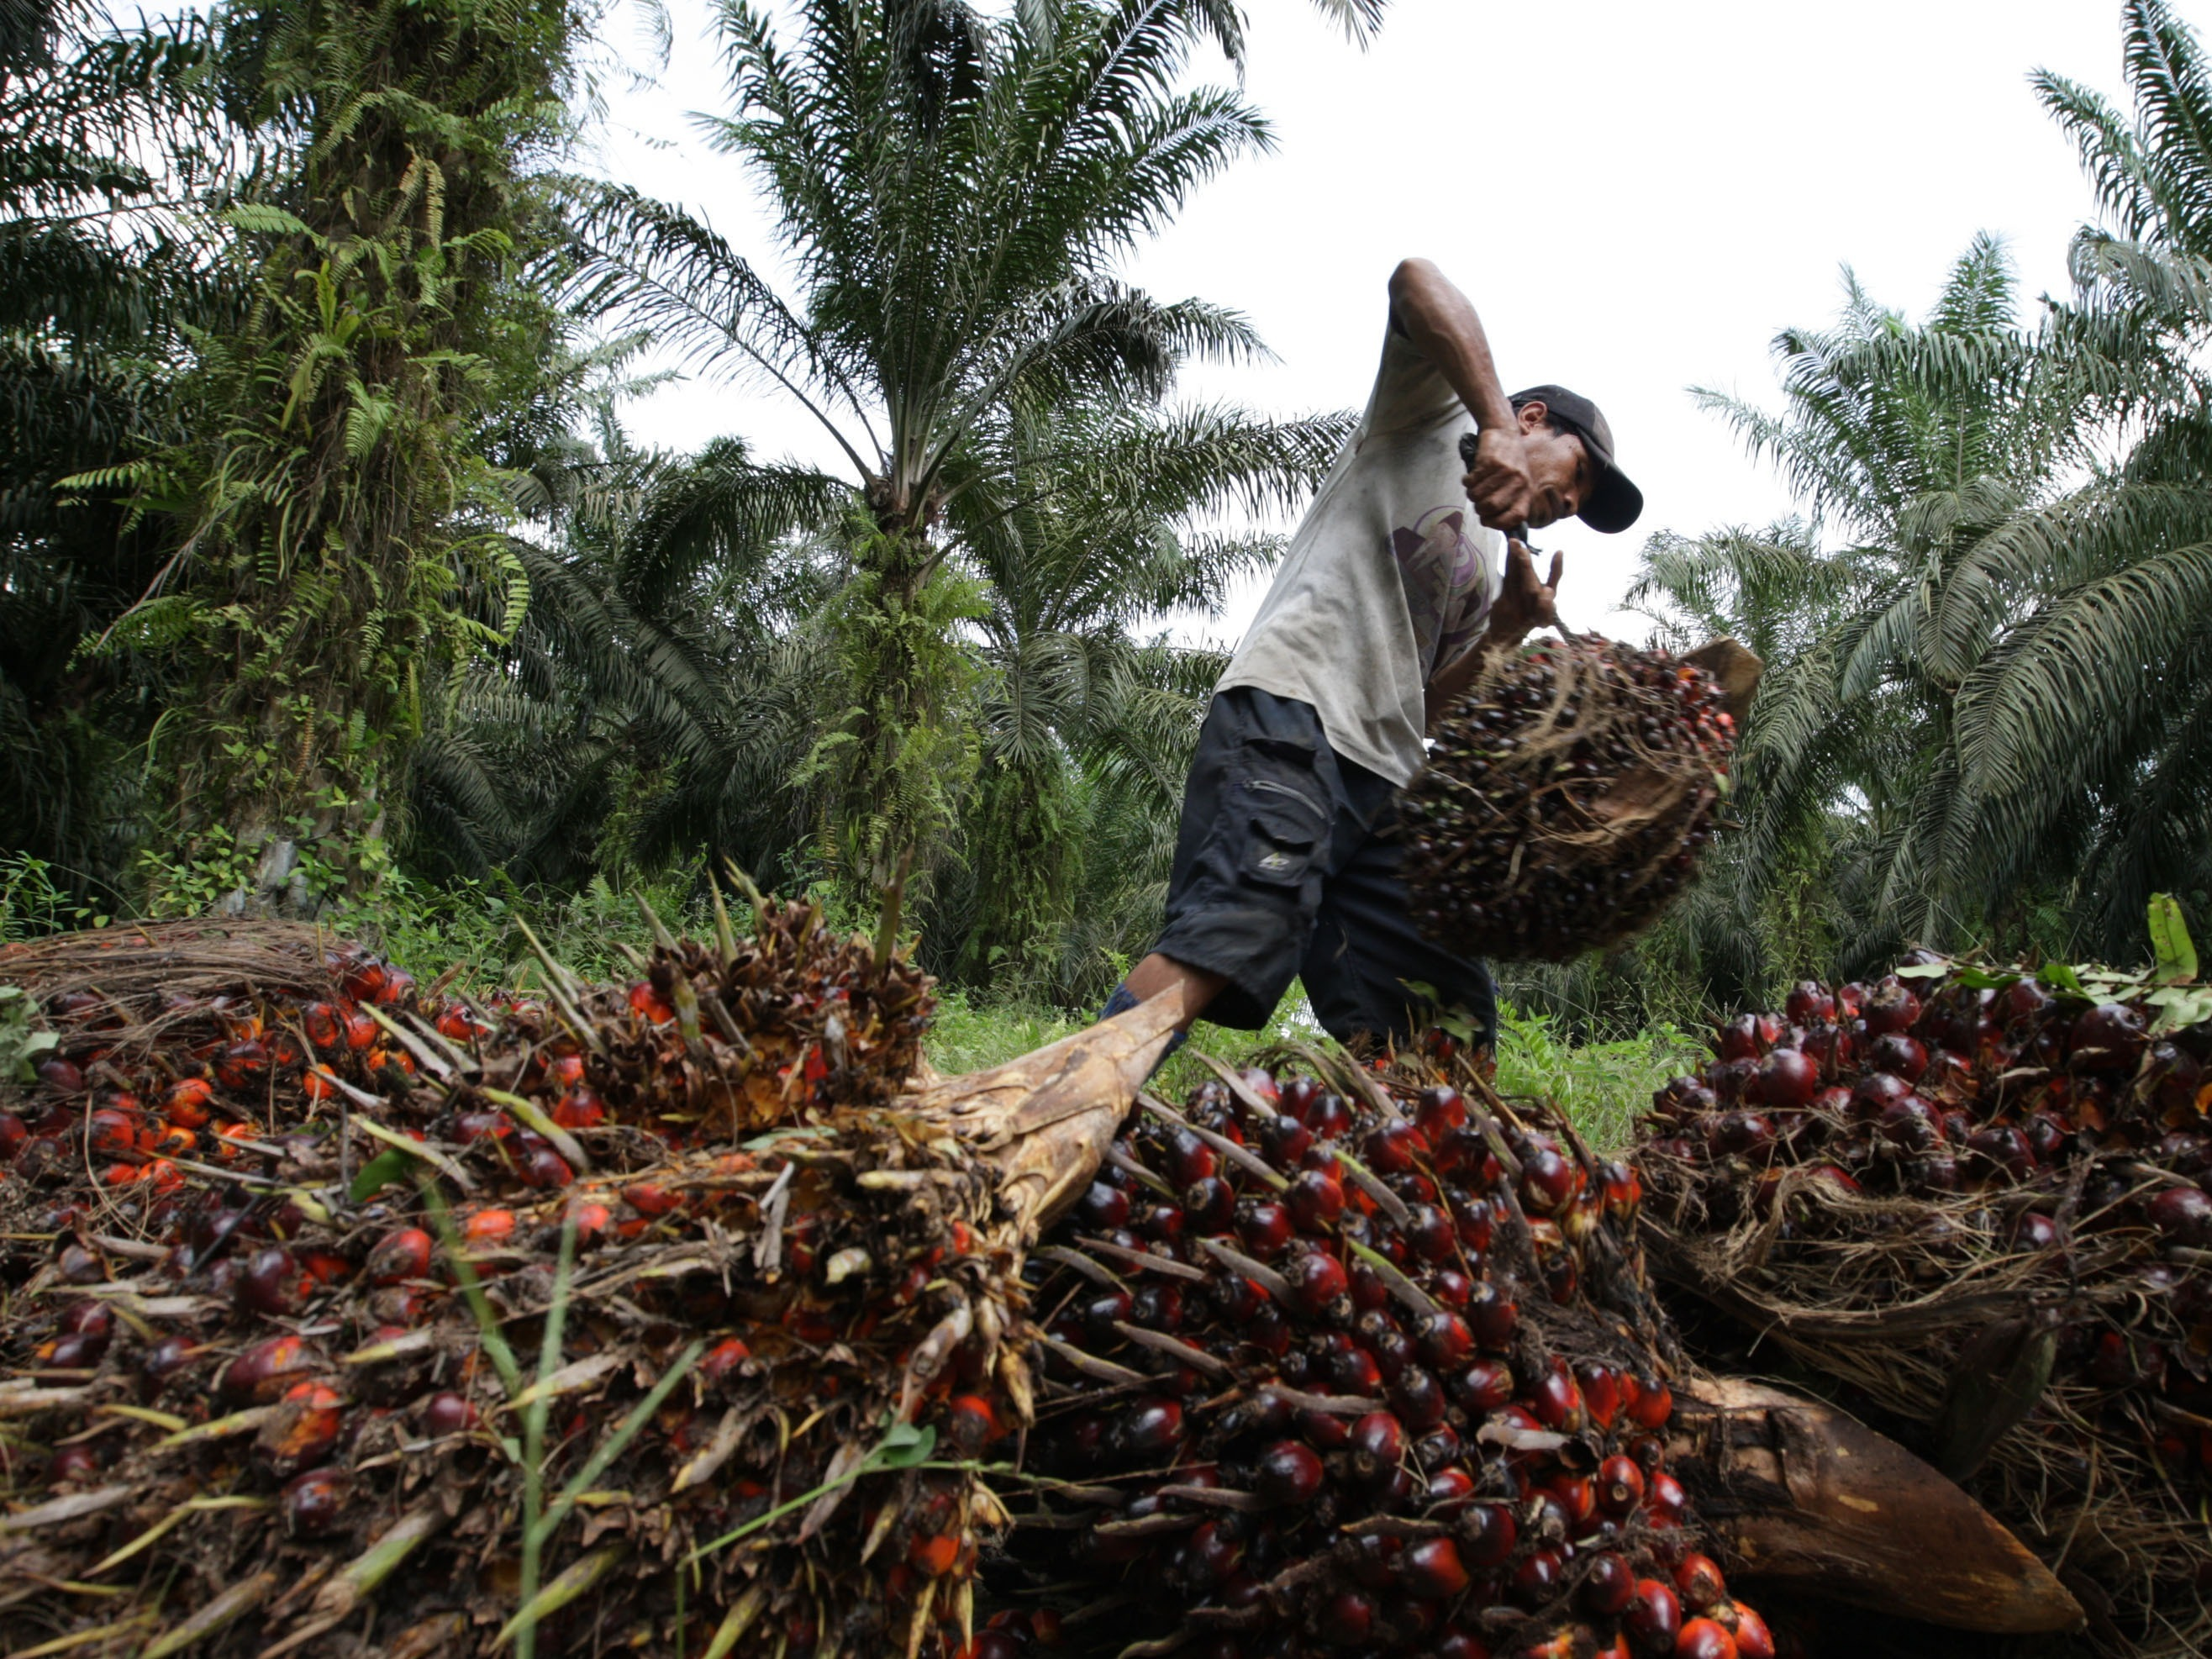 Entwicklungsminister Müller fordert Lieferketten ohne Regenwald-Zerstörung